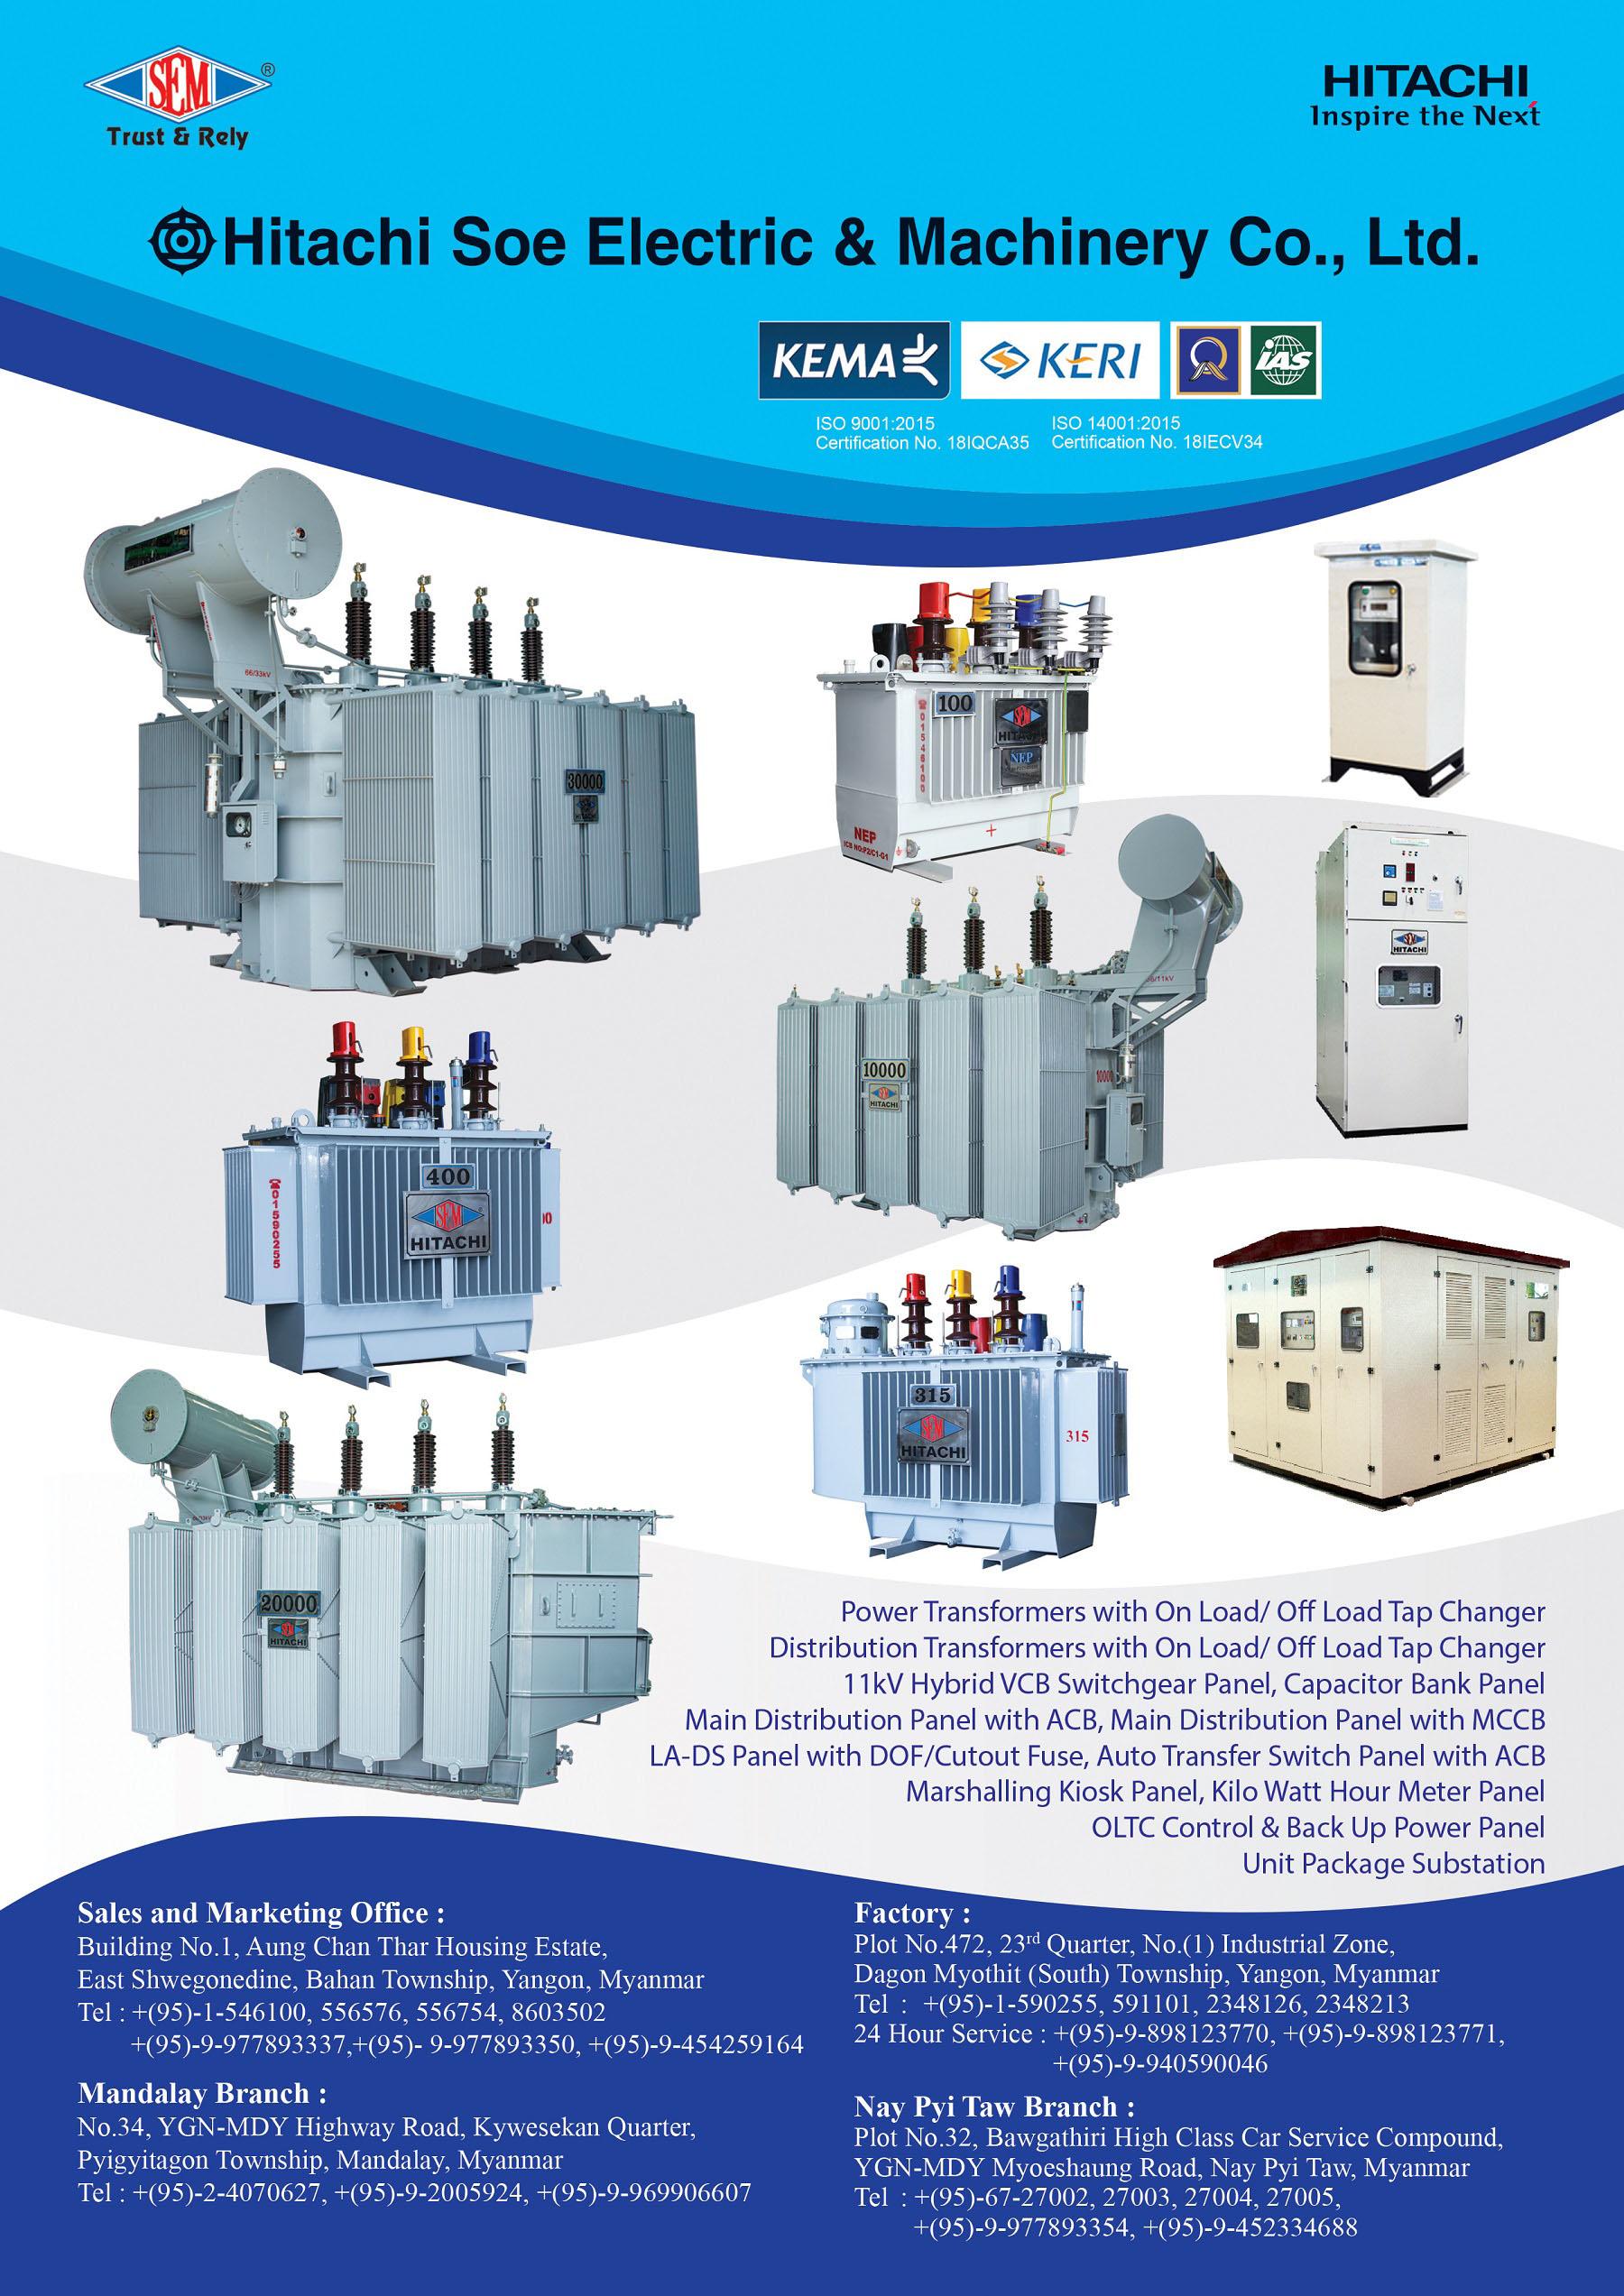 Hitachi Soe Electric and Machinery Co., Ltd.